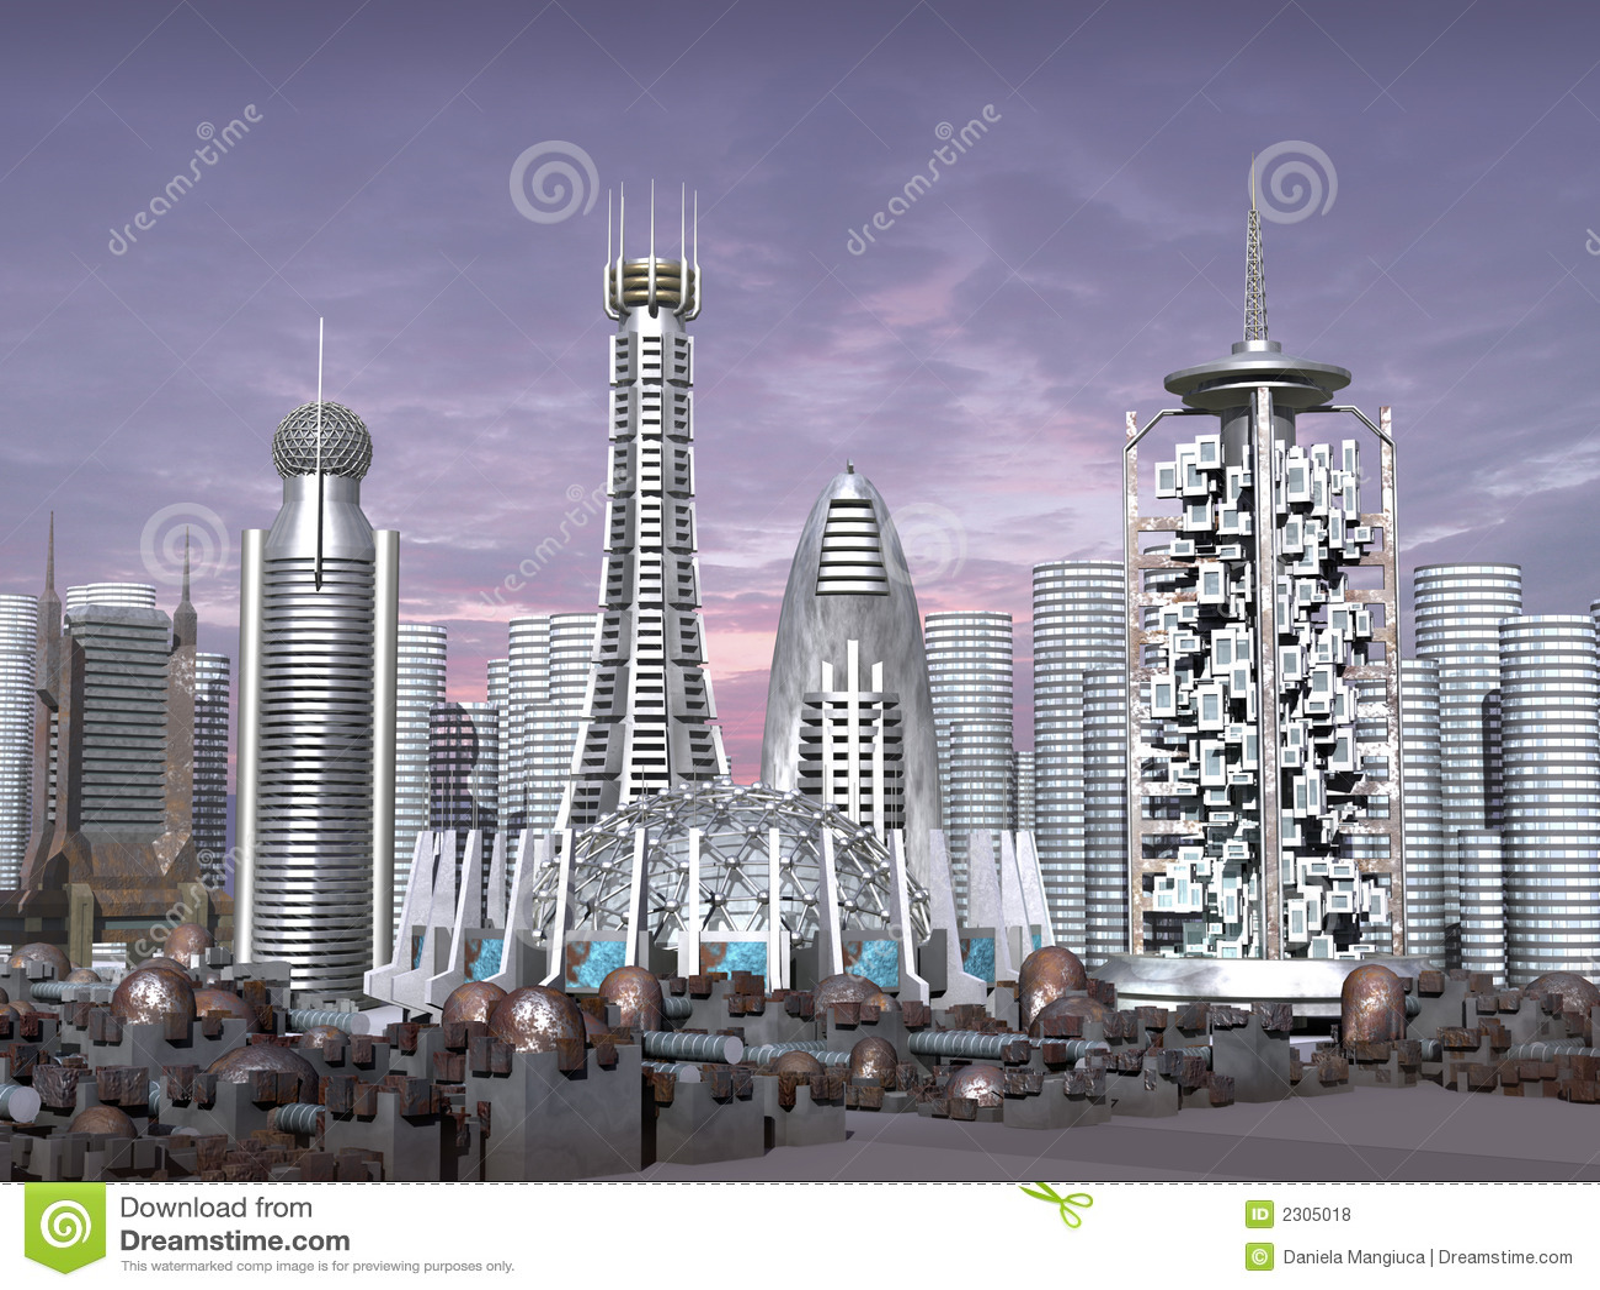 3d Model of Sci-fi city stock illustration  Illustration of